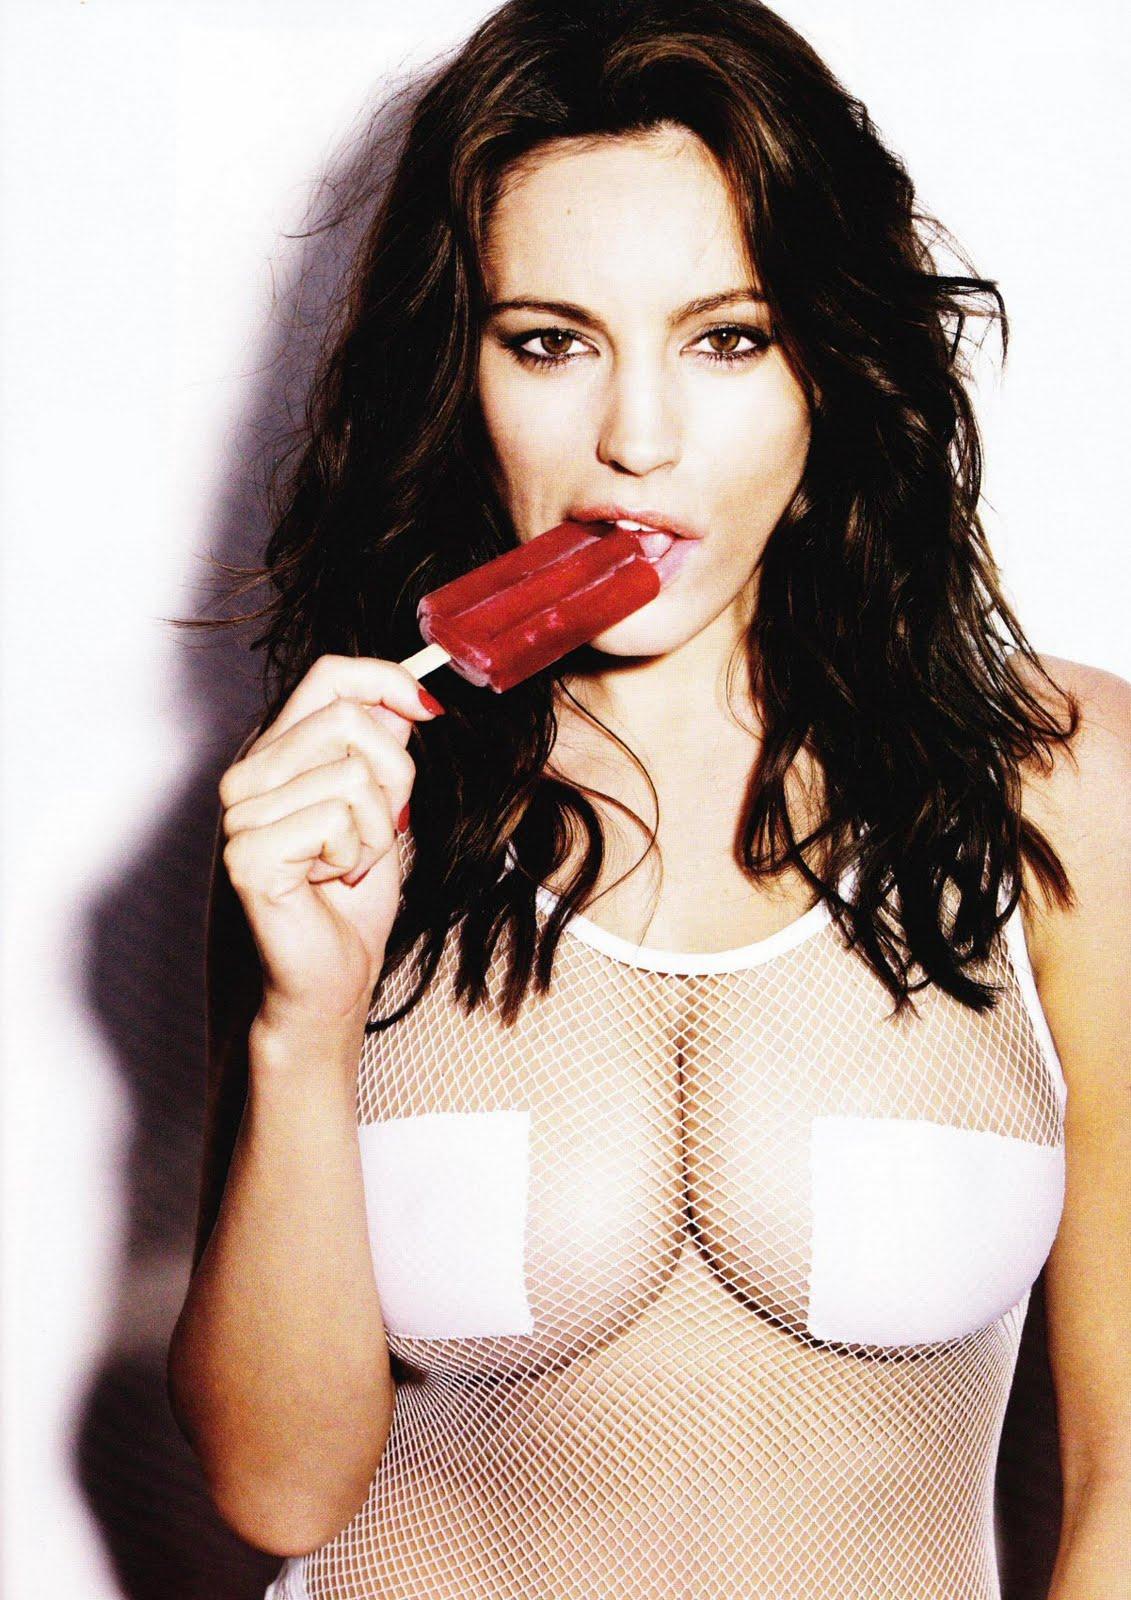 Kelly Brook hot english model sexy body photo%252B%252525281%25252529 nude fuck lesbian cock girls